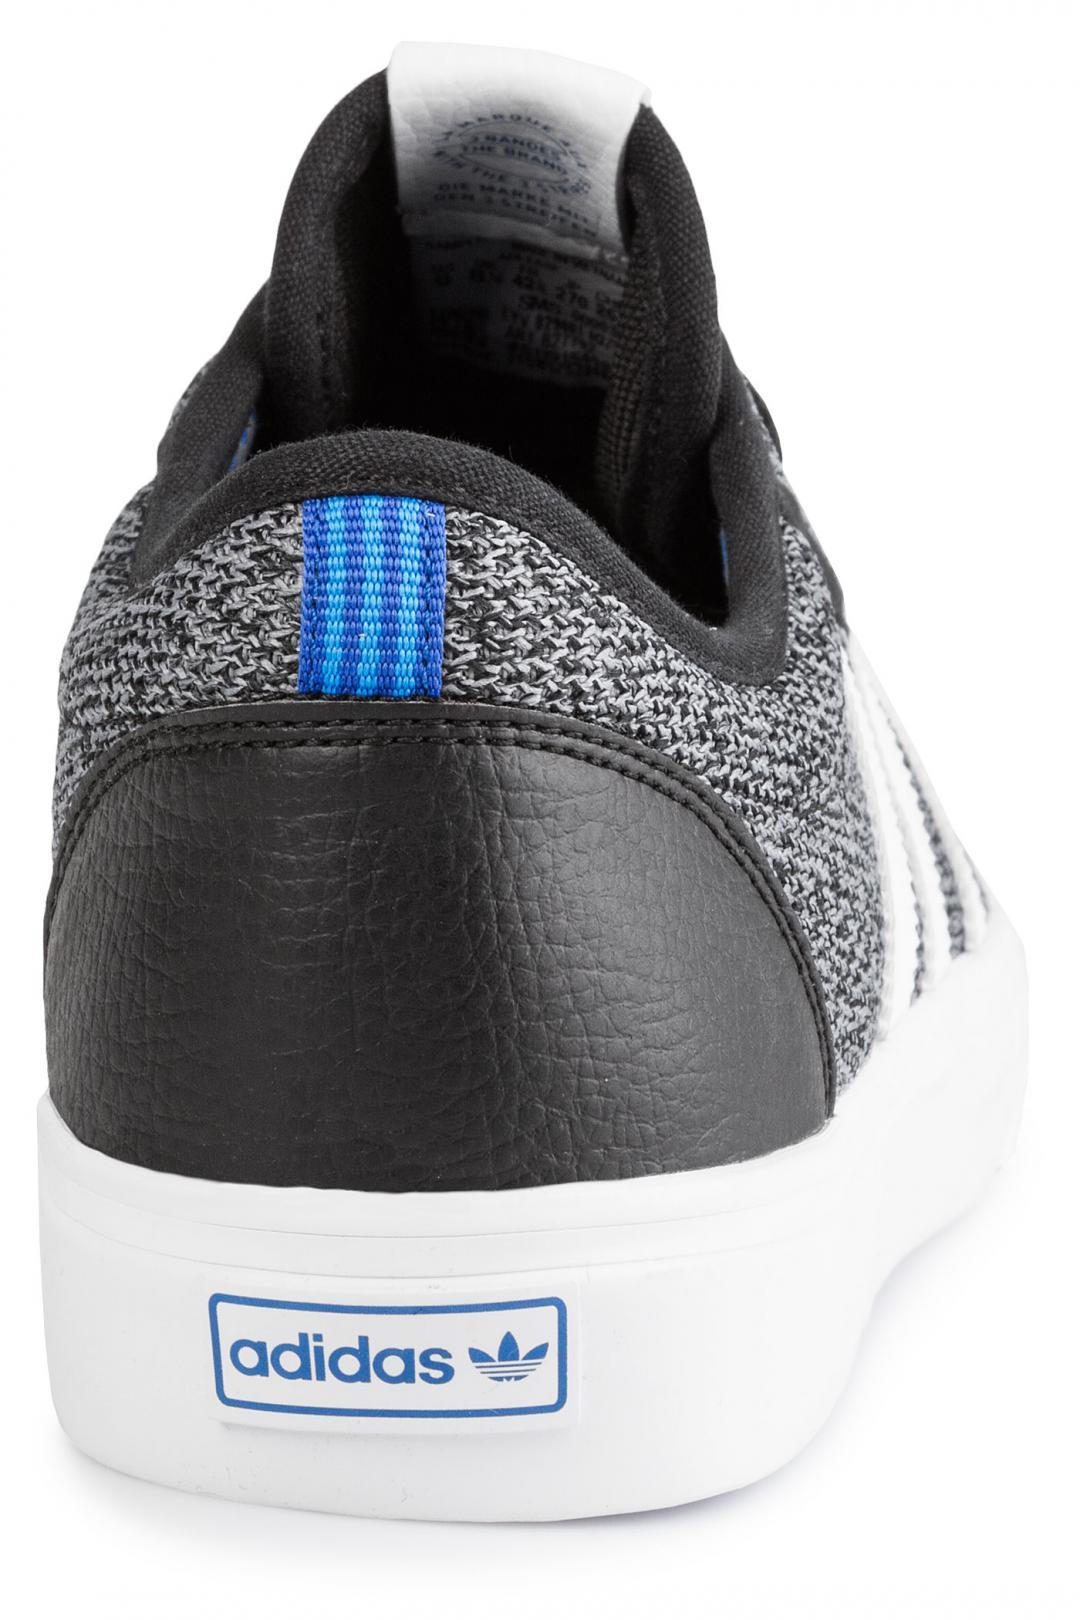 Uomo adidas Skateboarding Adi Ease core black grey three white   Scarpe da skate